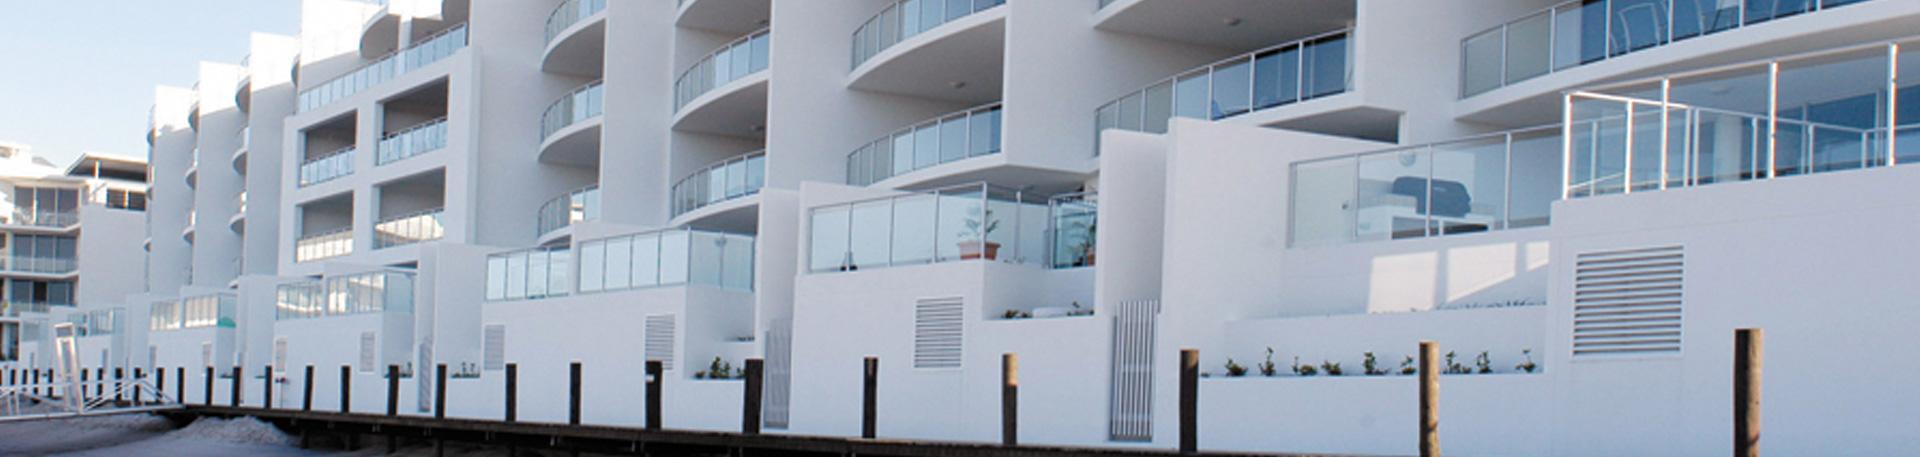 Deepwater Apartments